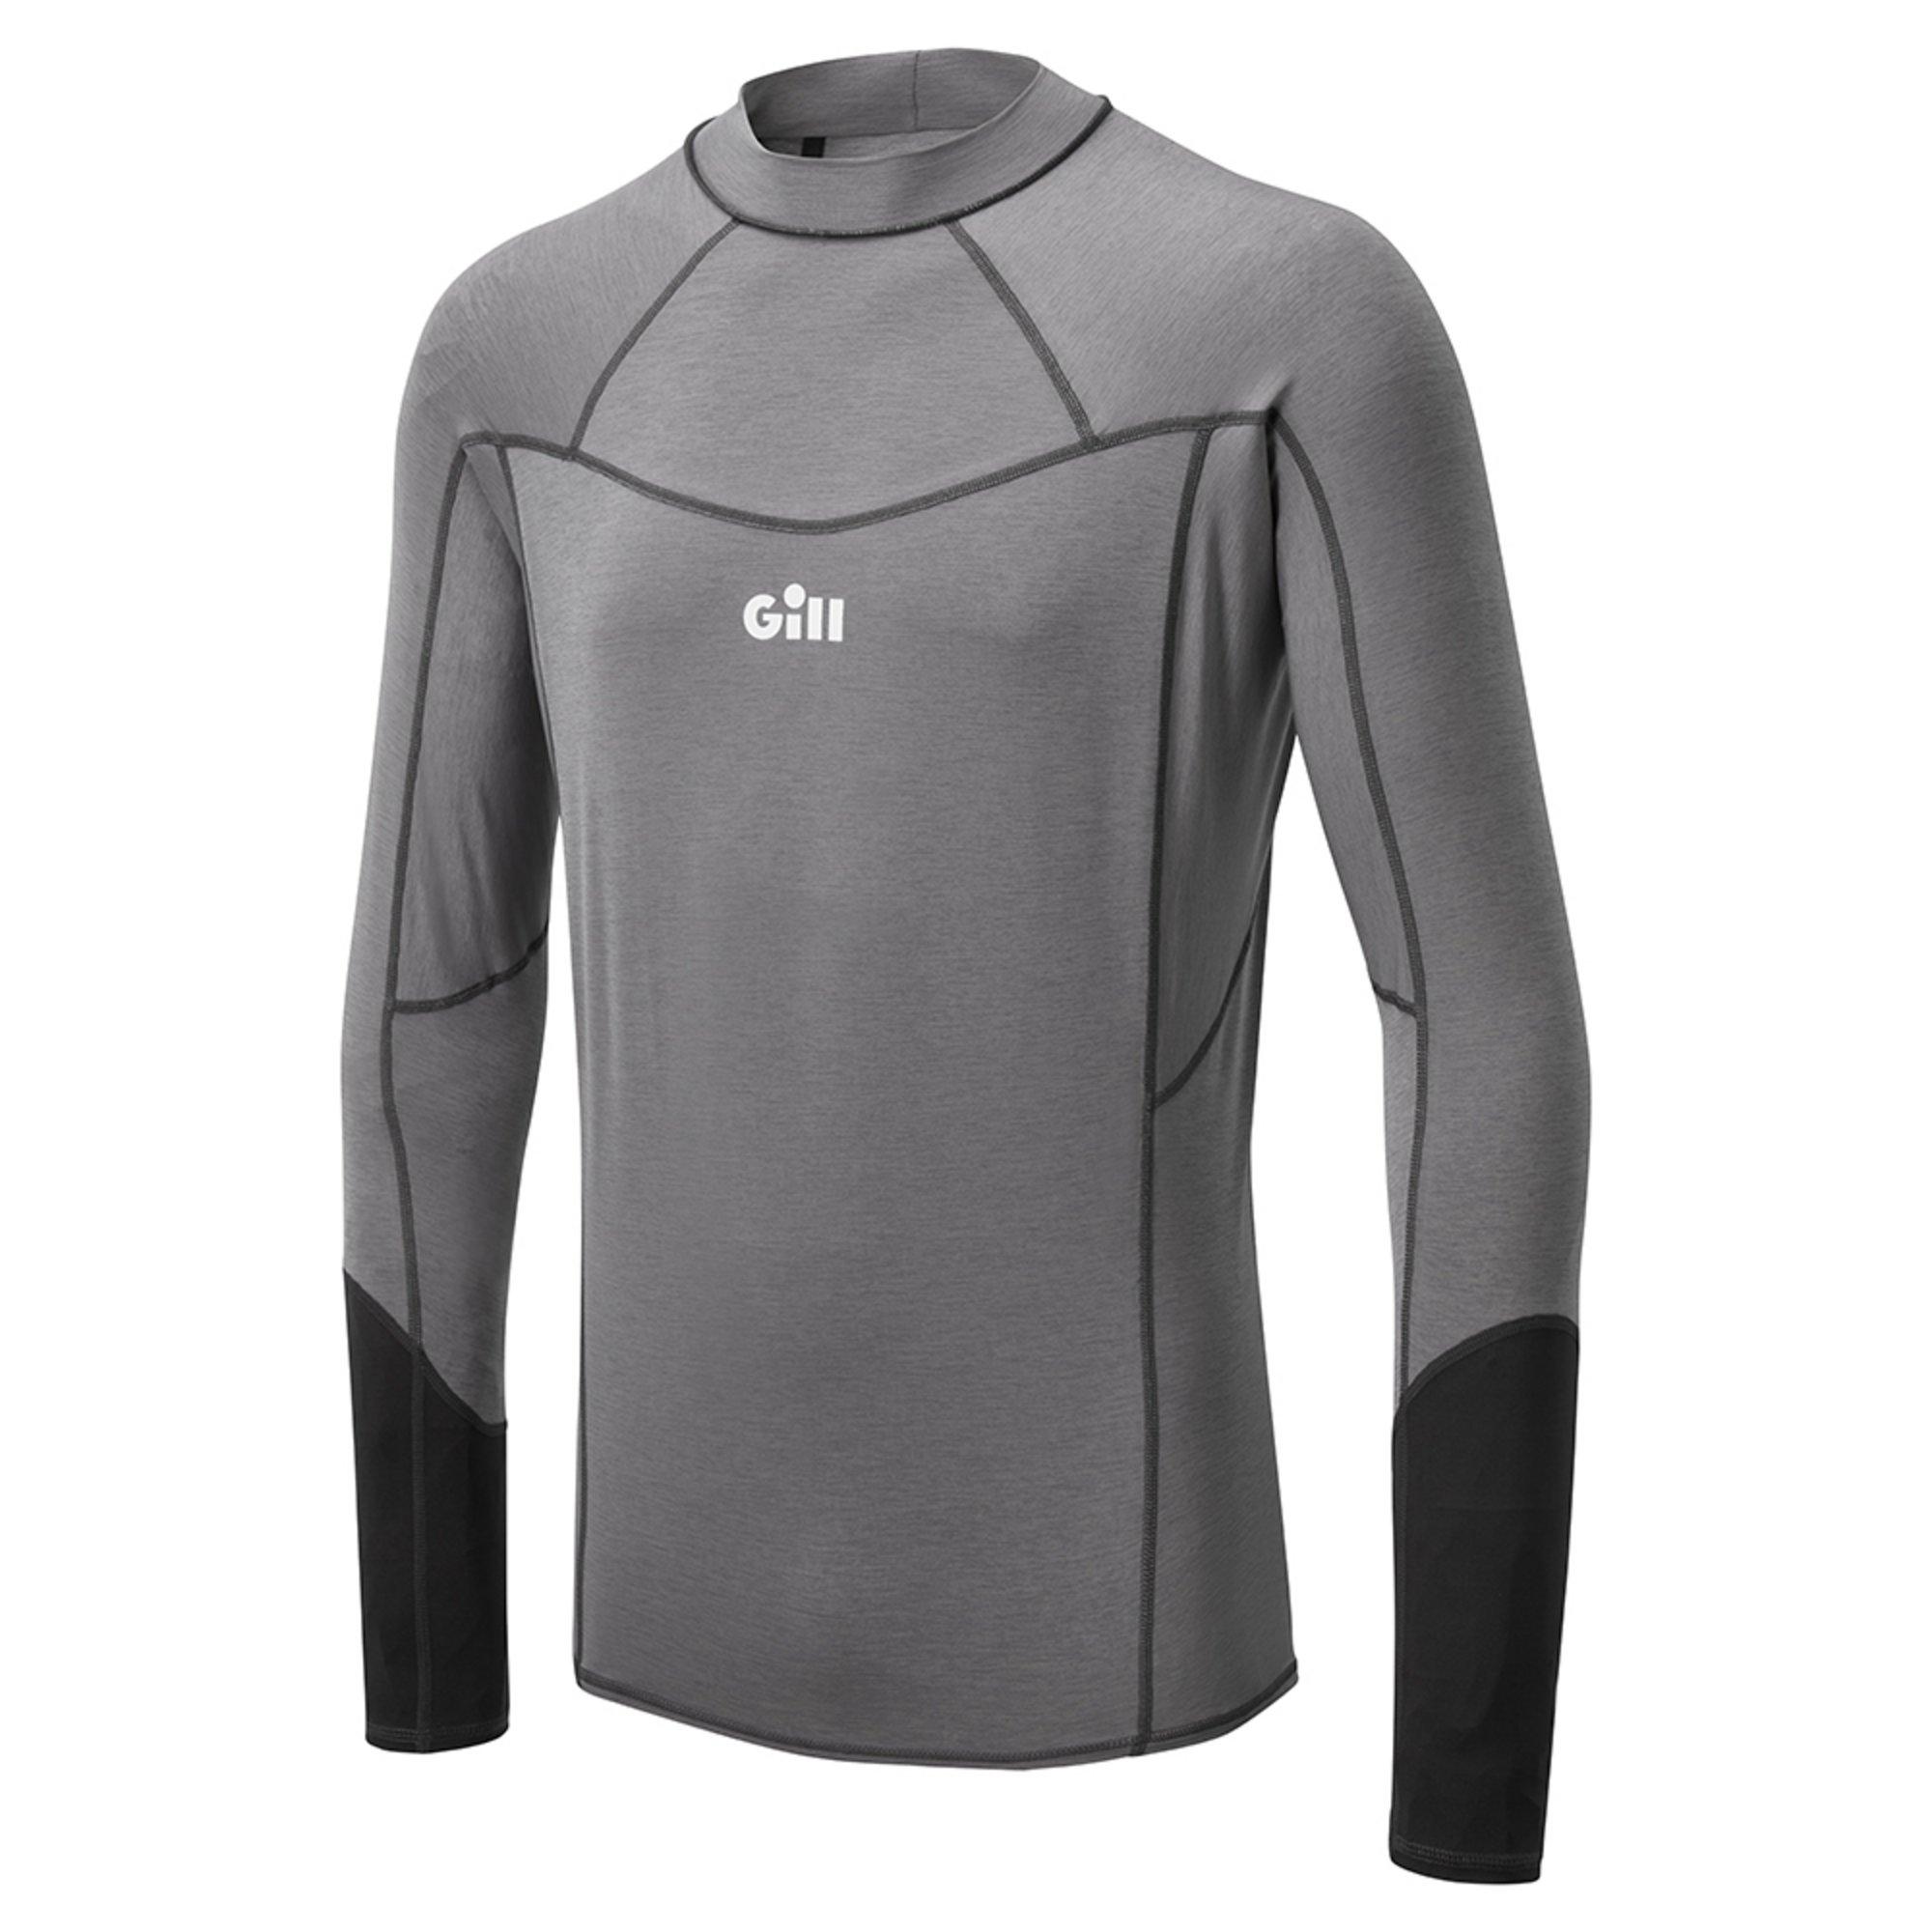 Men's Eco Pro Rash Vest - Long Sleeve - 5025-GRE18_3.jpg